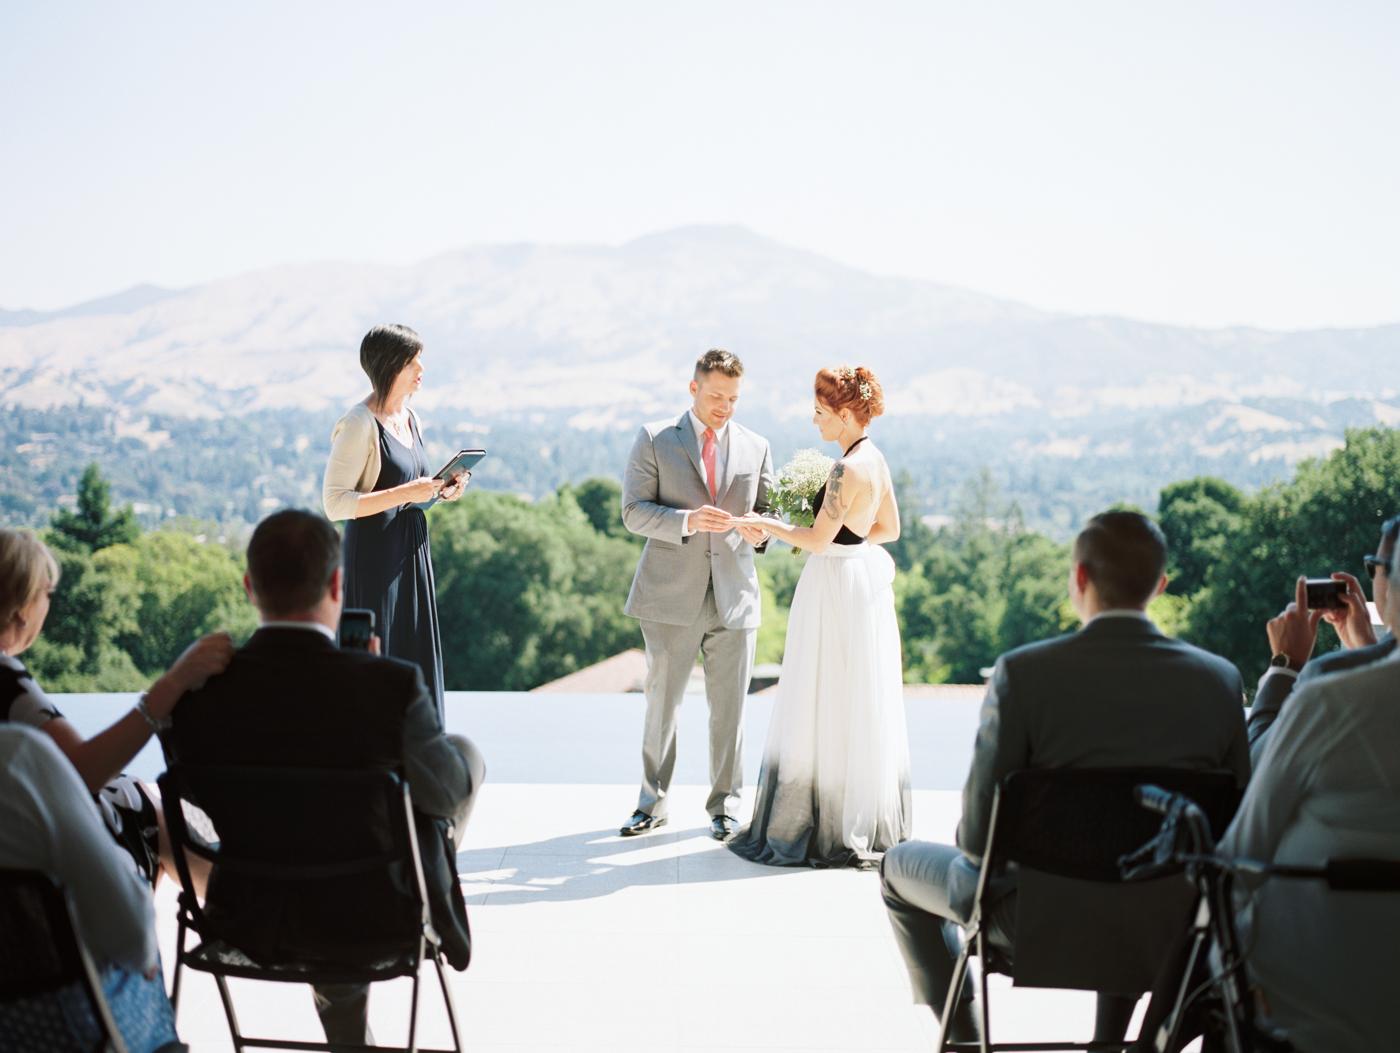 Kipp Emily s Intimate Private Estate Wedding-Kipp Emily GWS-0230.jpg